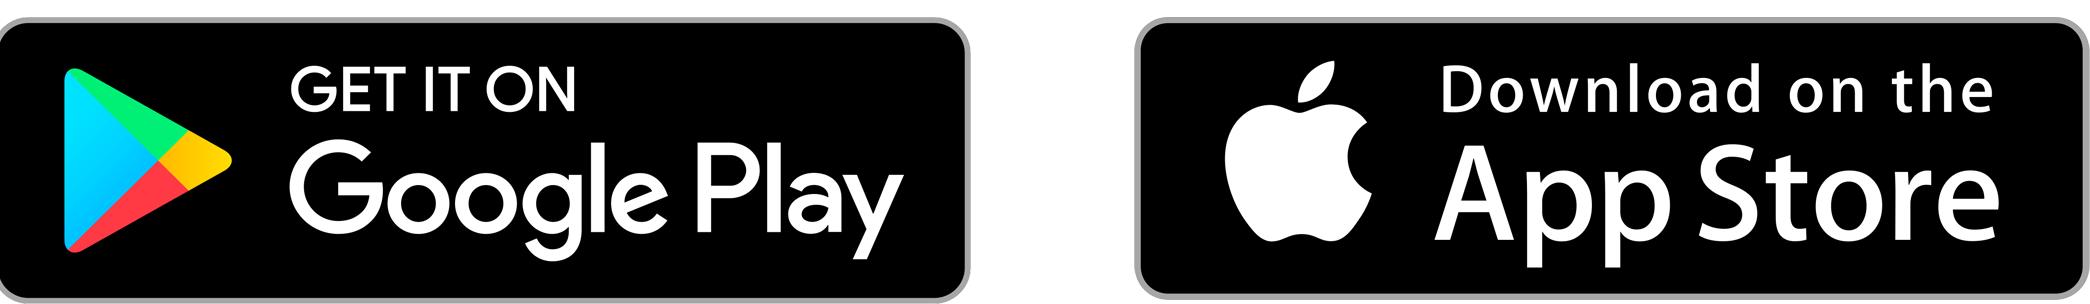 SeekPng.com_google-play-logo-png_202991